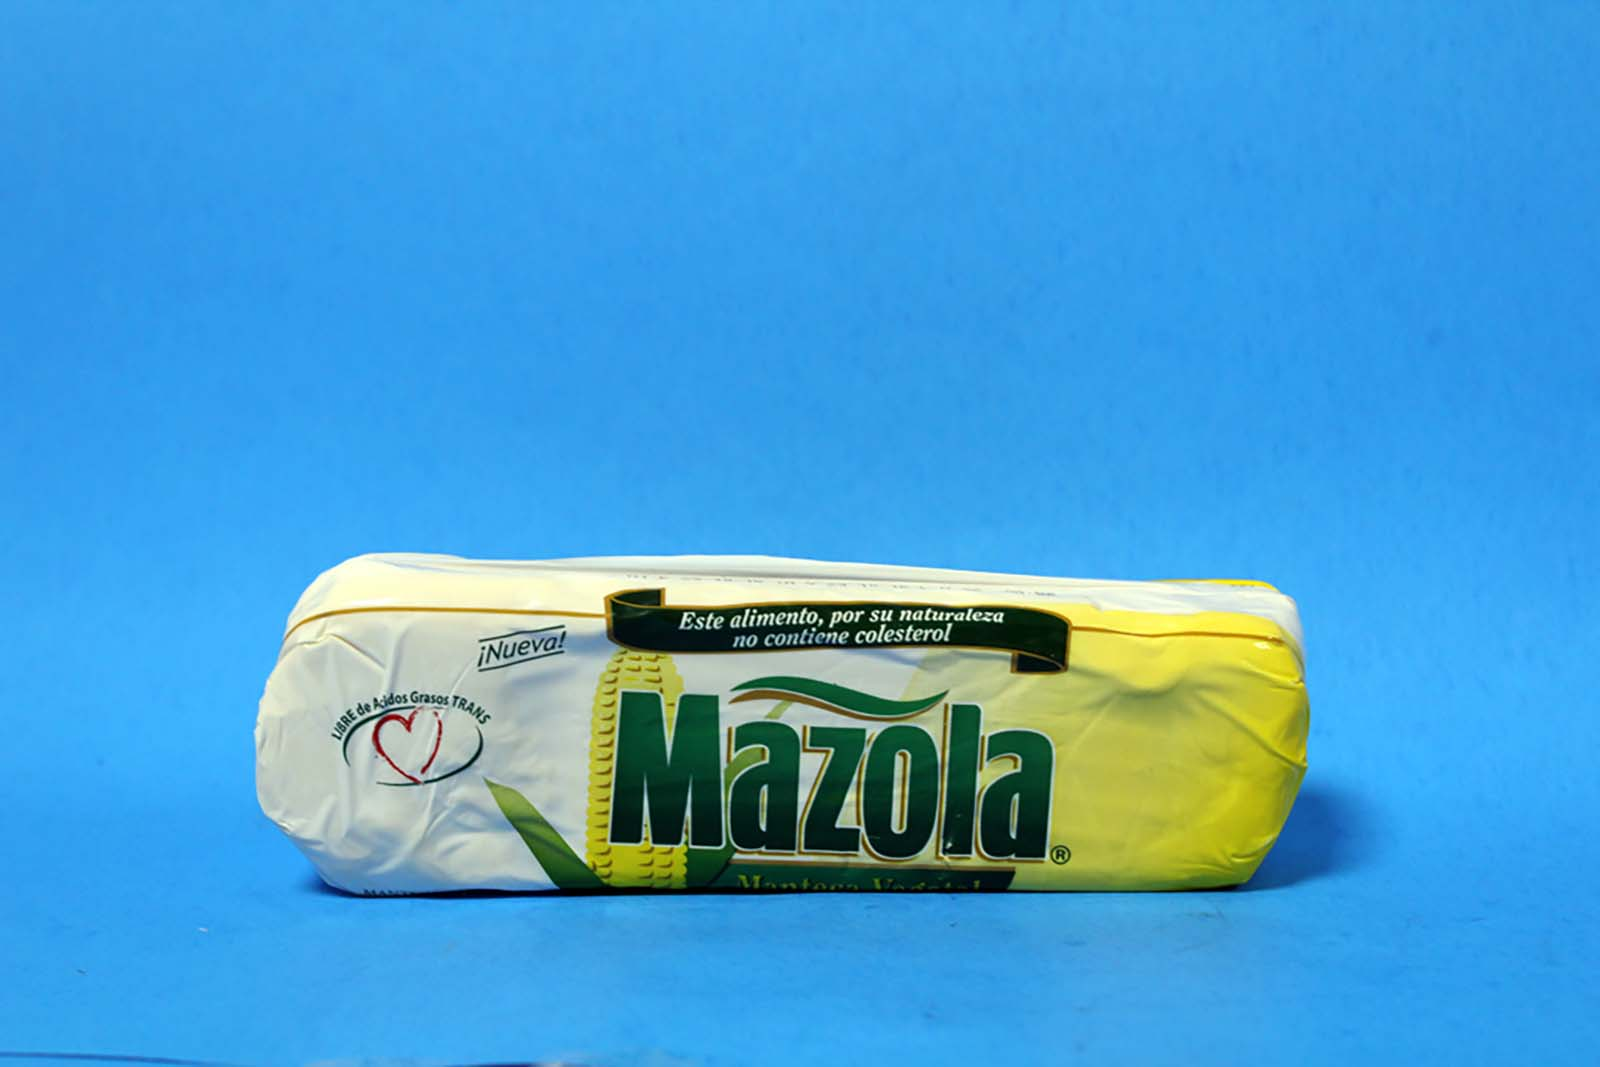 Mazola Lard Manteca Saraga International Grocery